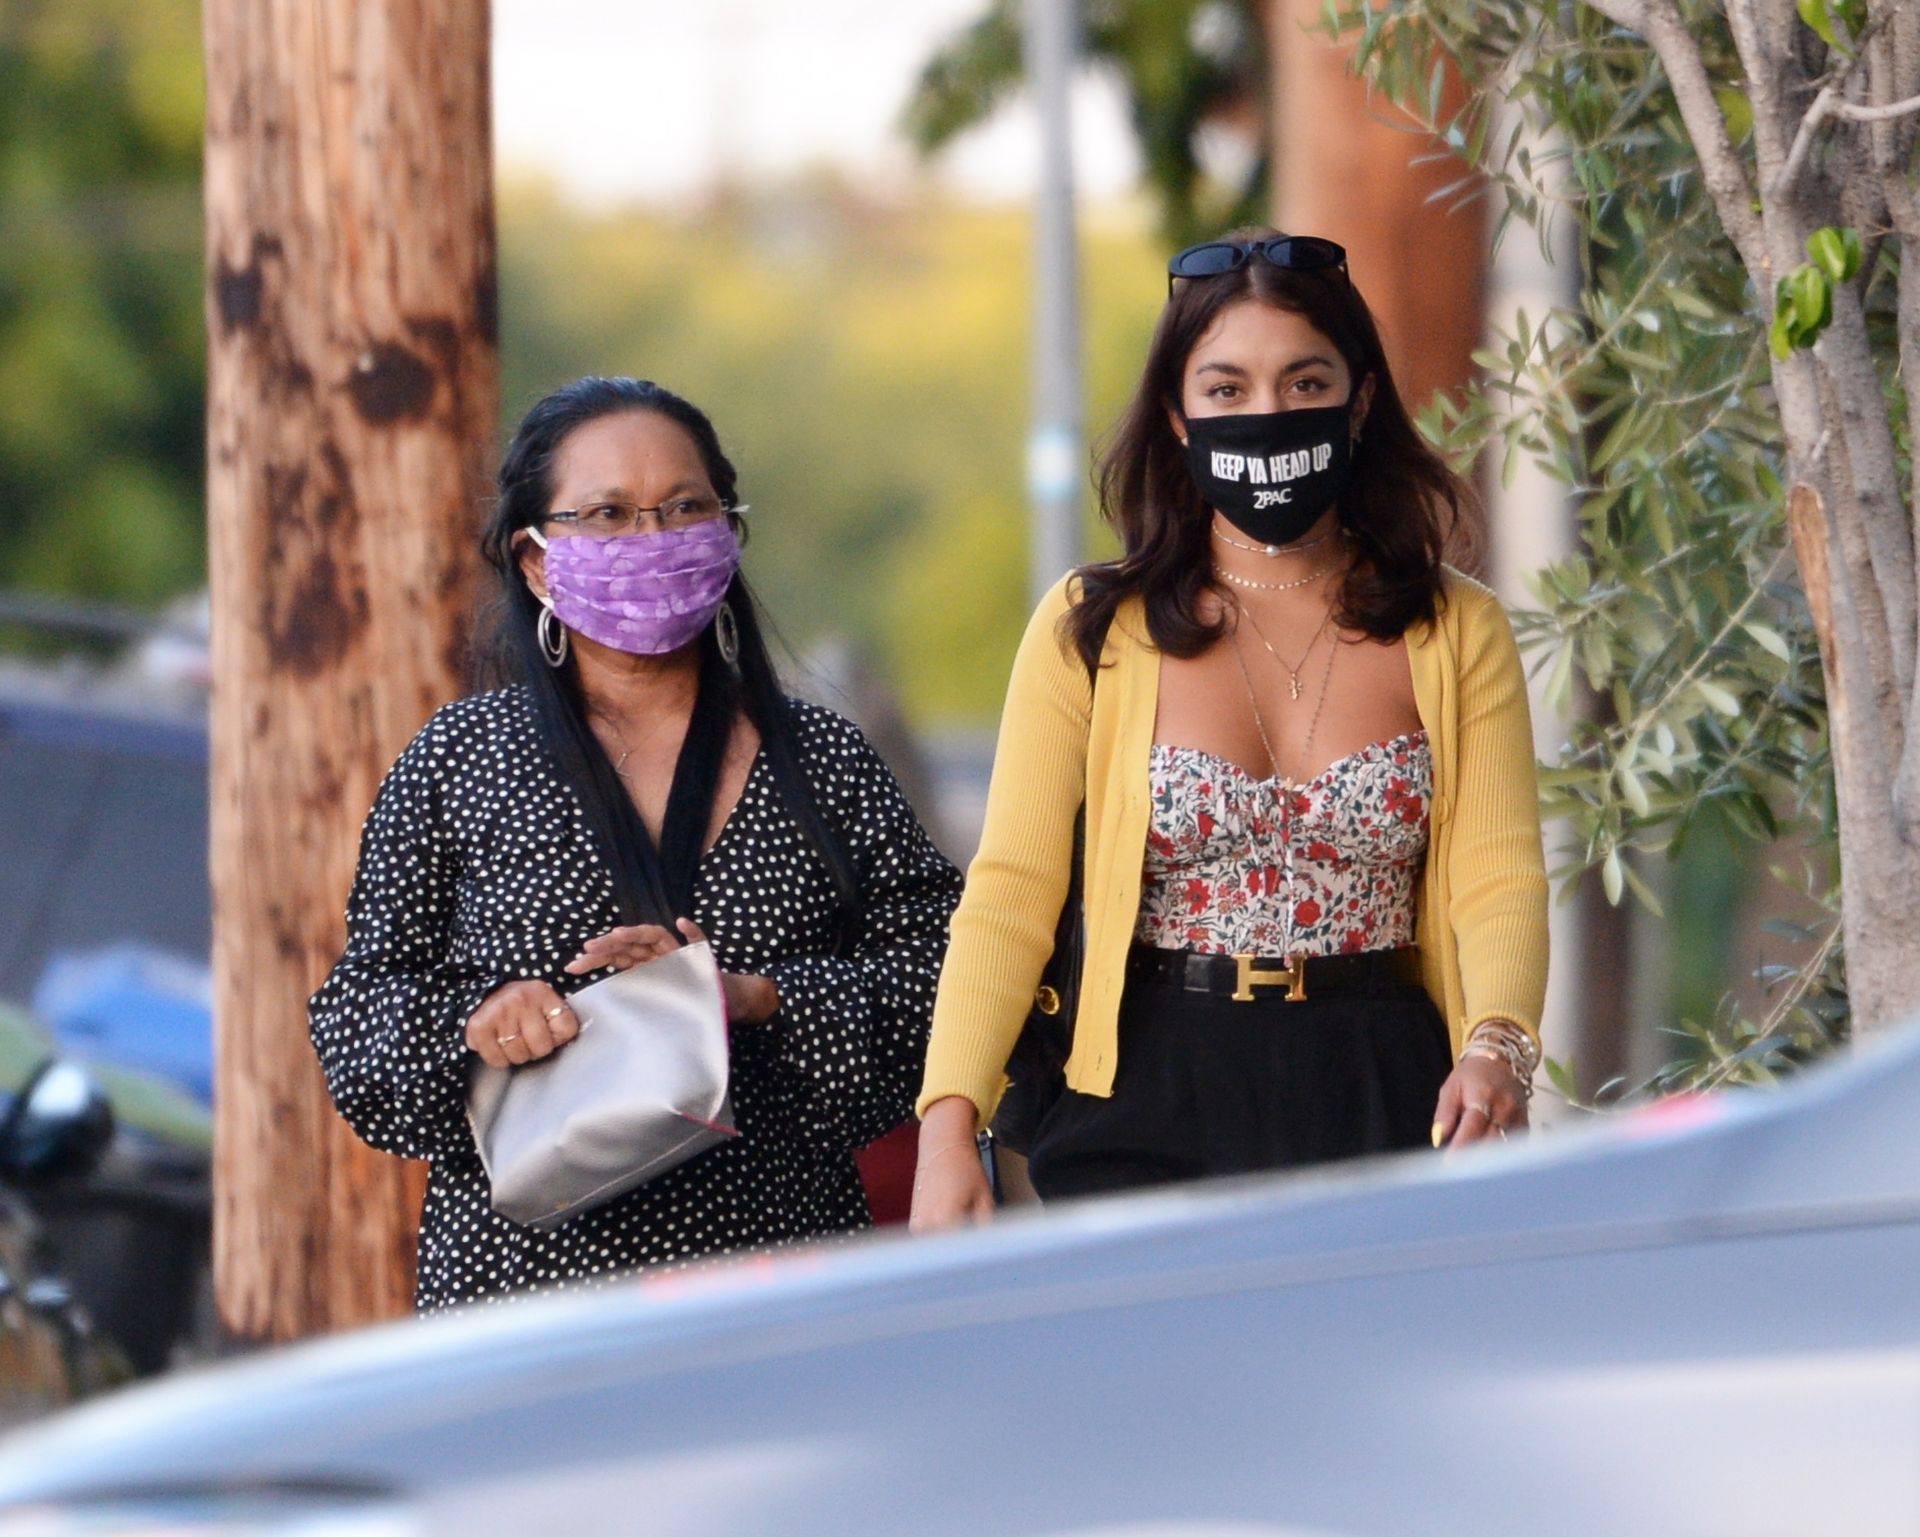 Vanessa Hudgens – Sexy Boobs And Ass At Farfalla In Los Angeles 0003